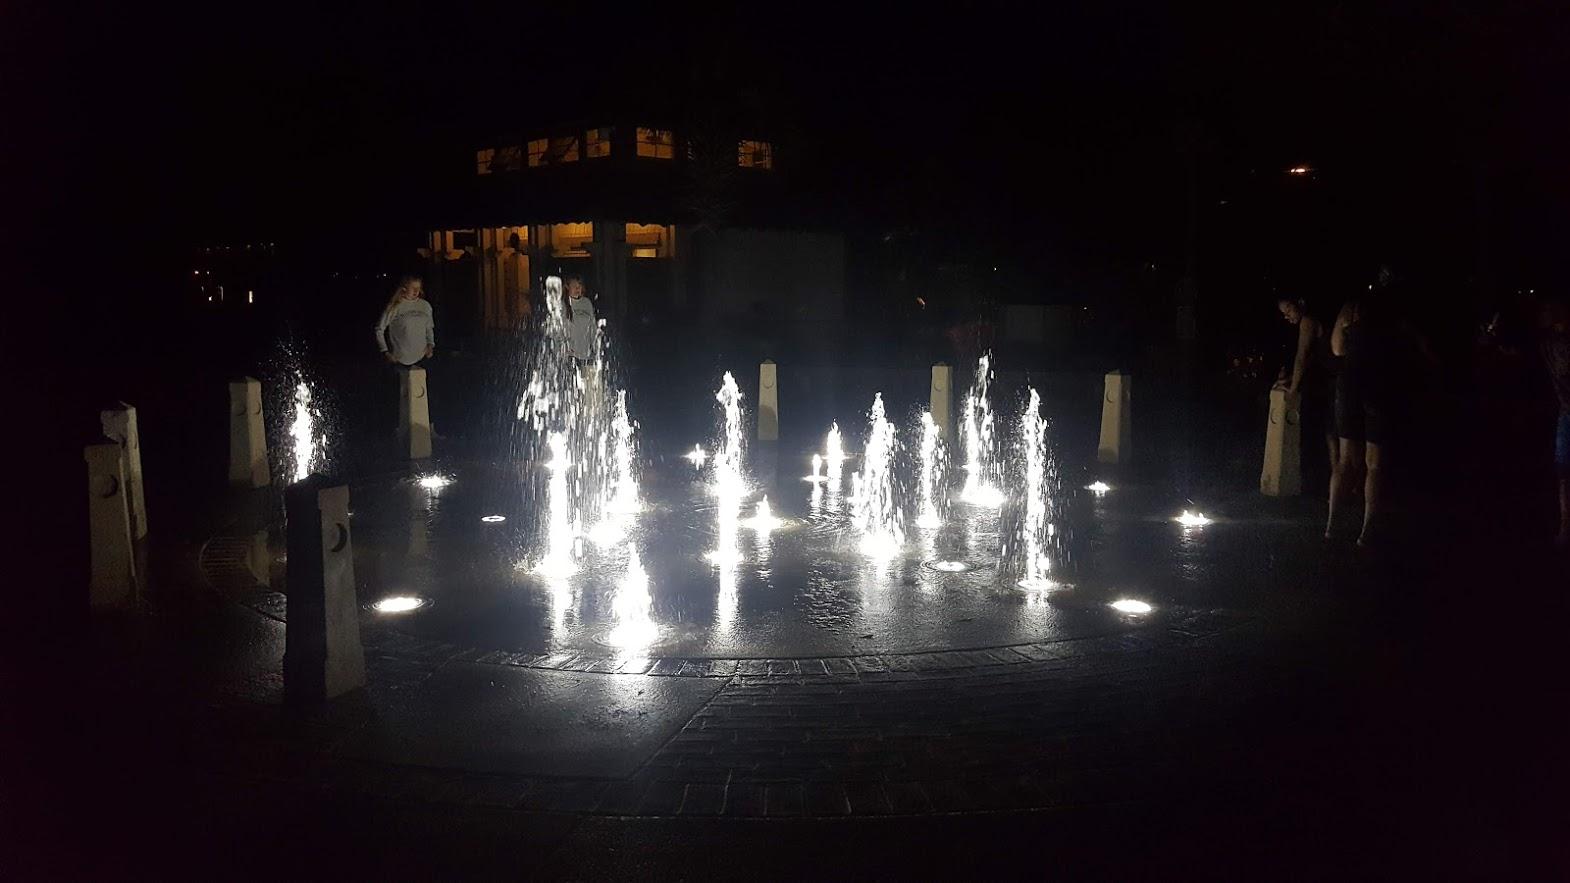 Hilton Head 3